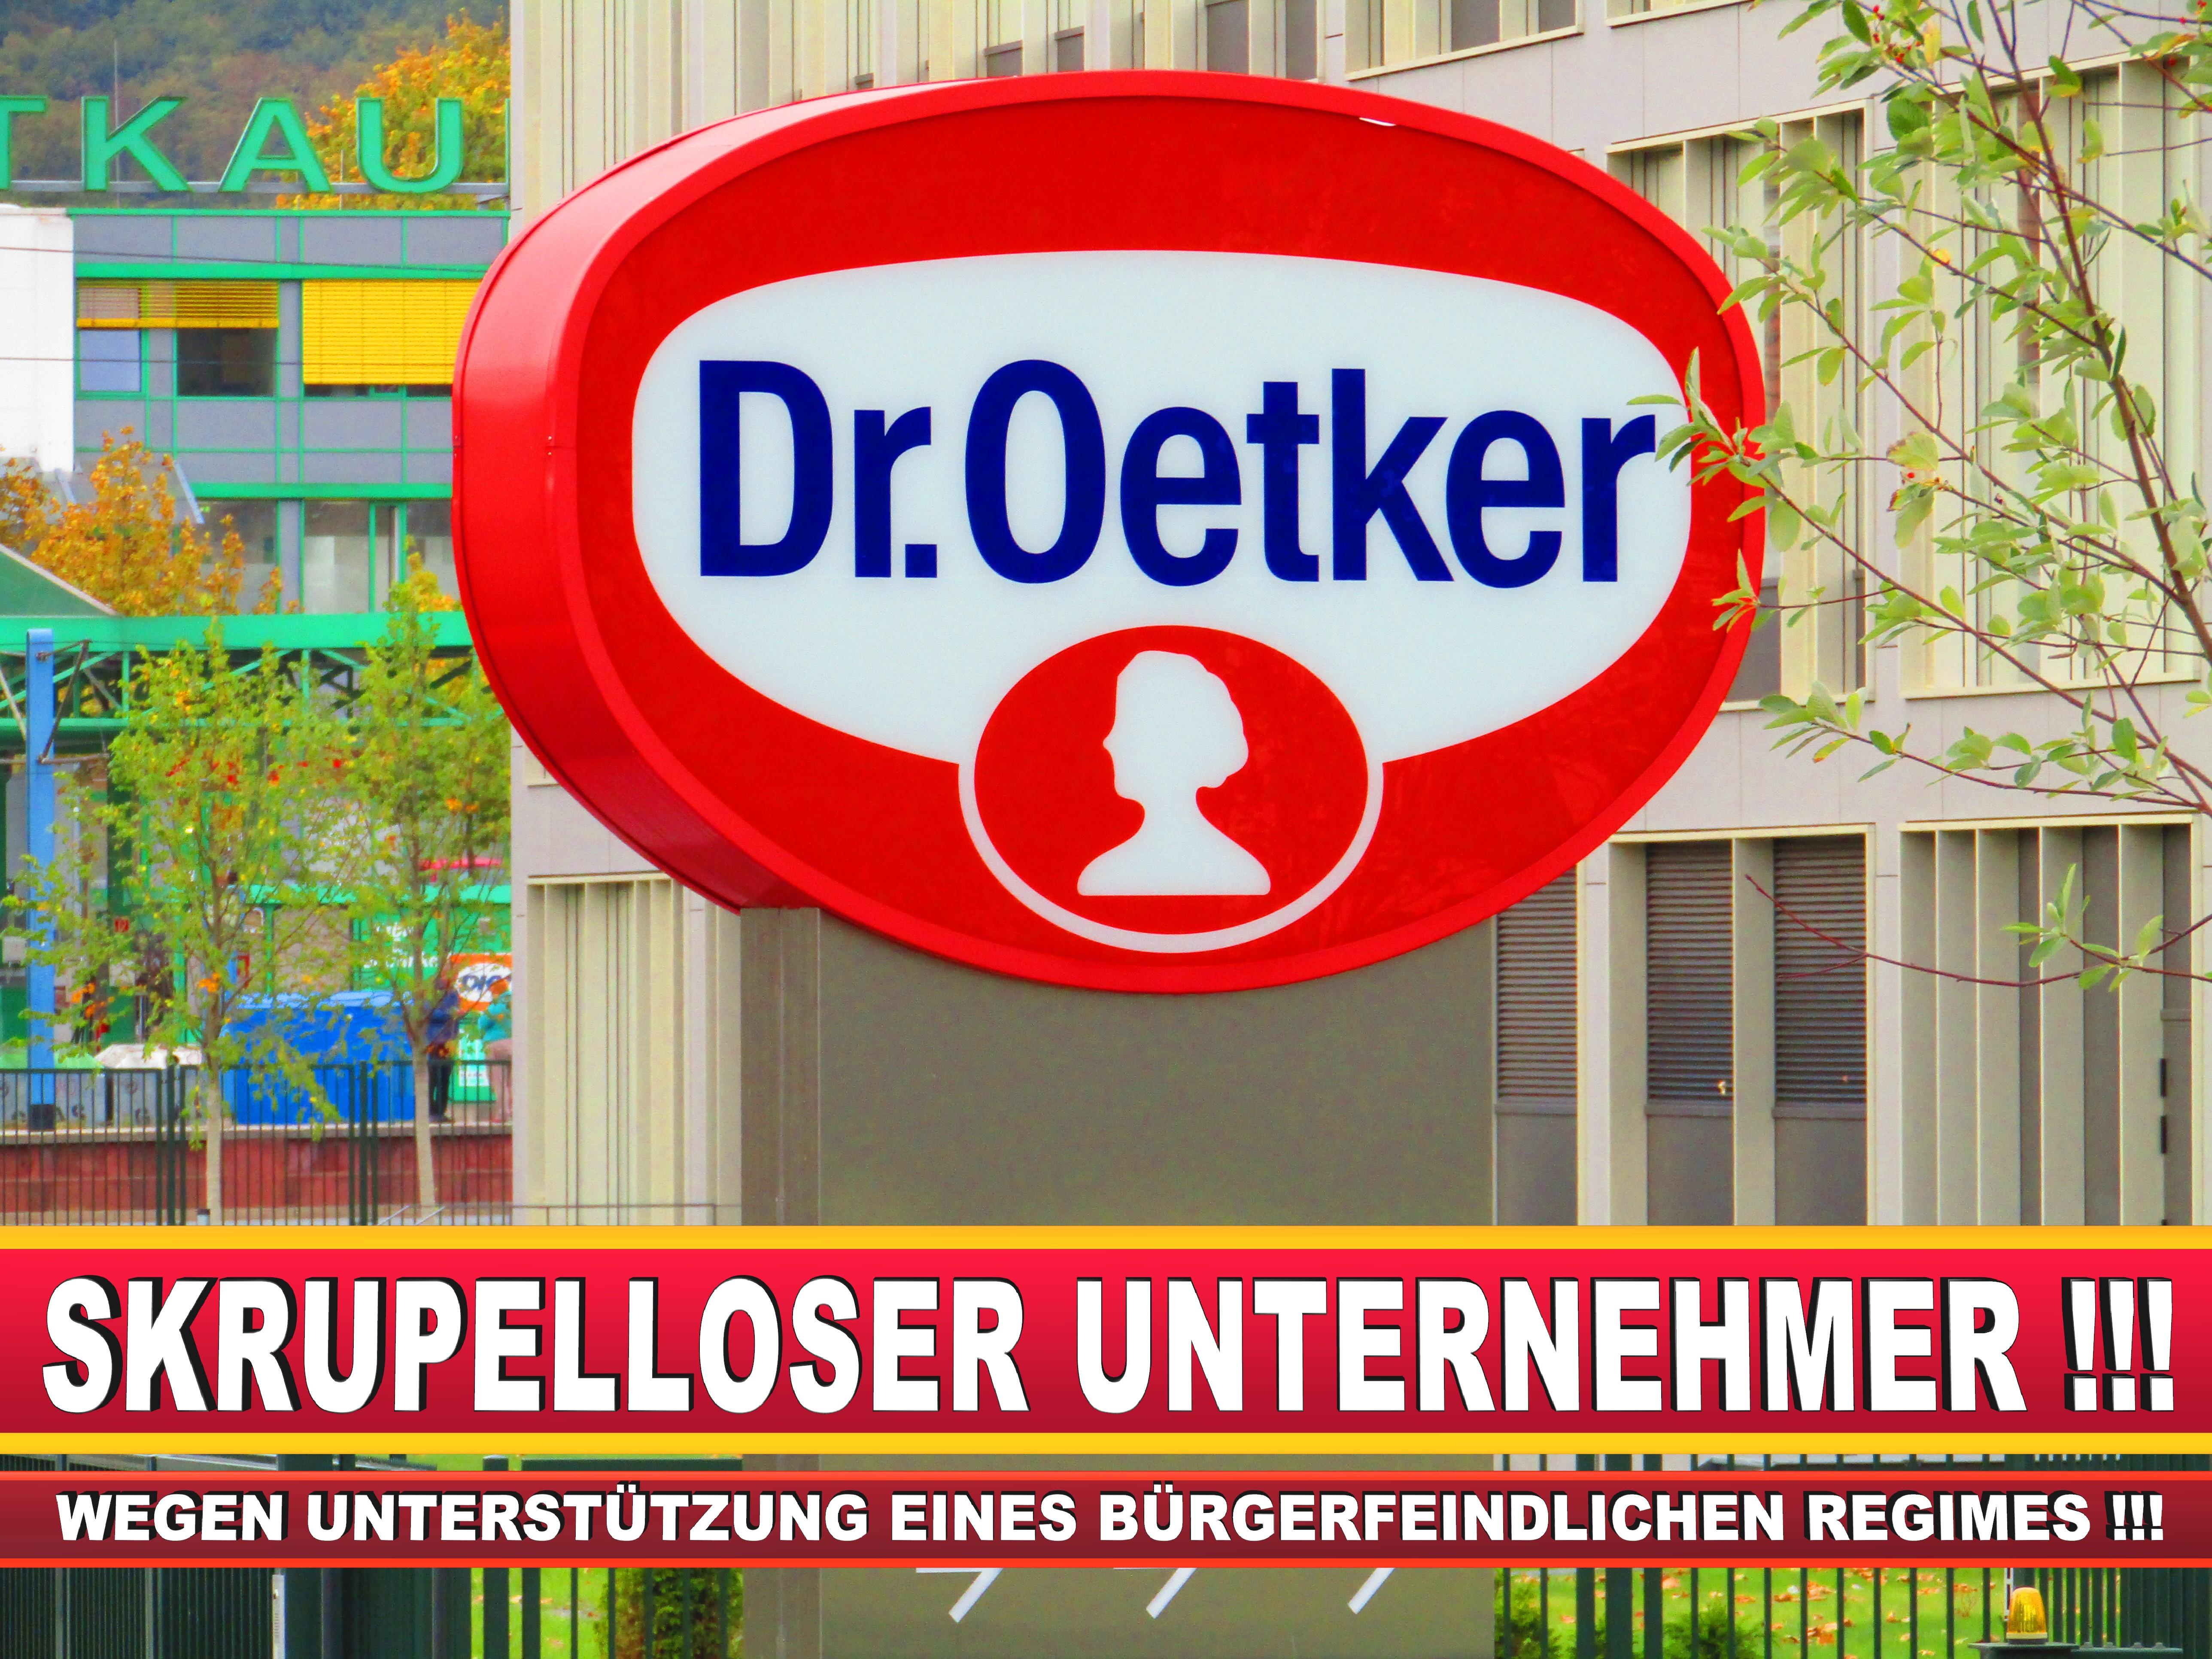 Dr Oetker Bielefeld CDU Bielefeld Spendengelder Skandal Richard August (32)